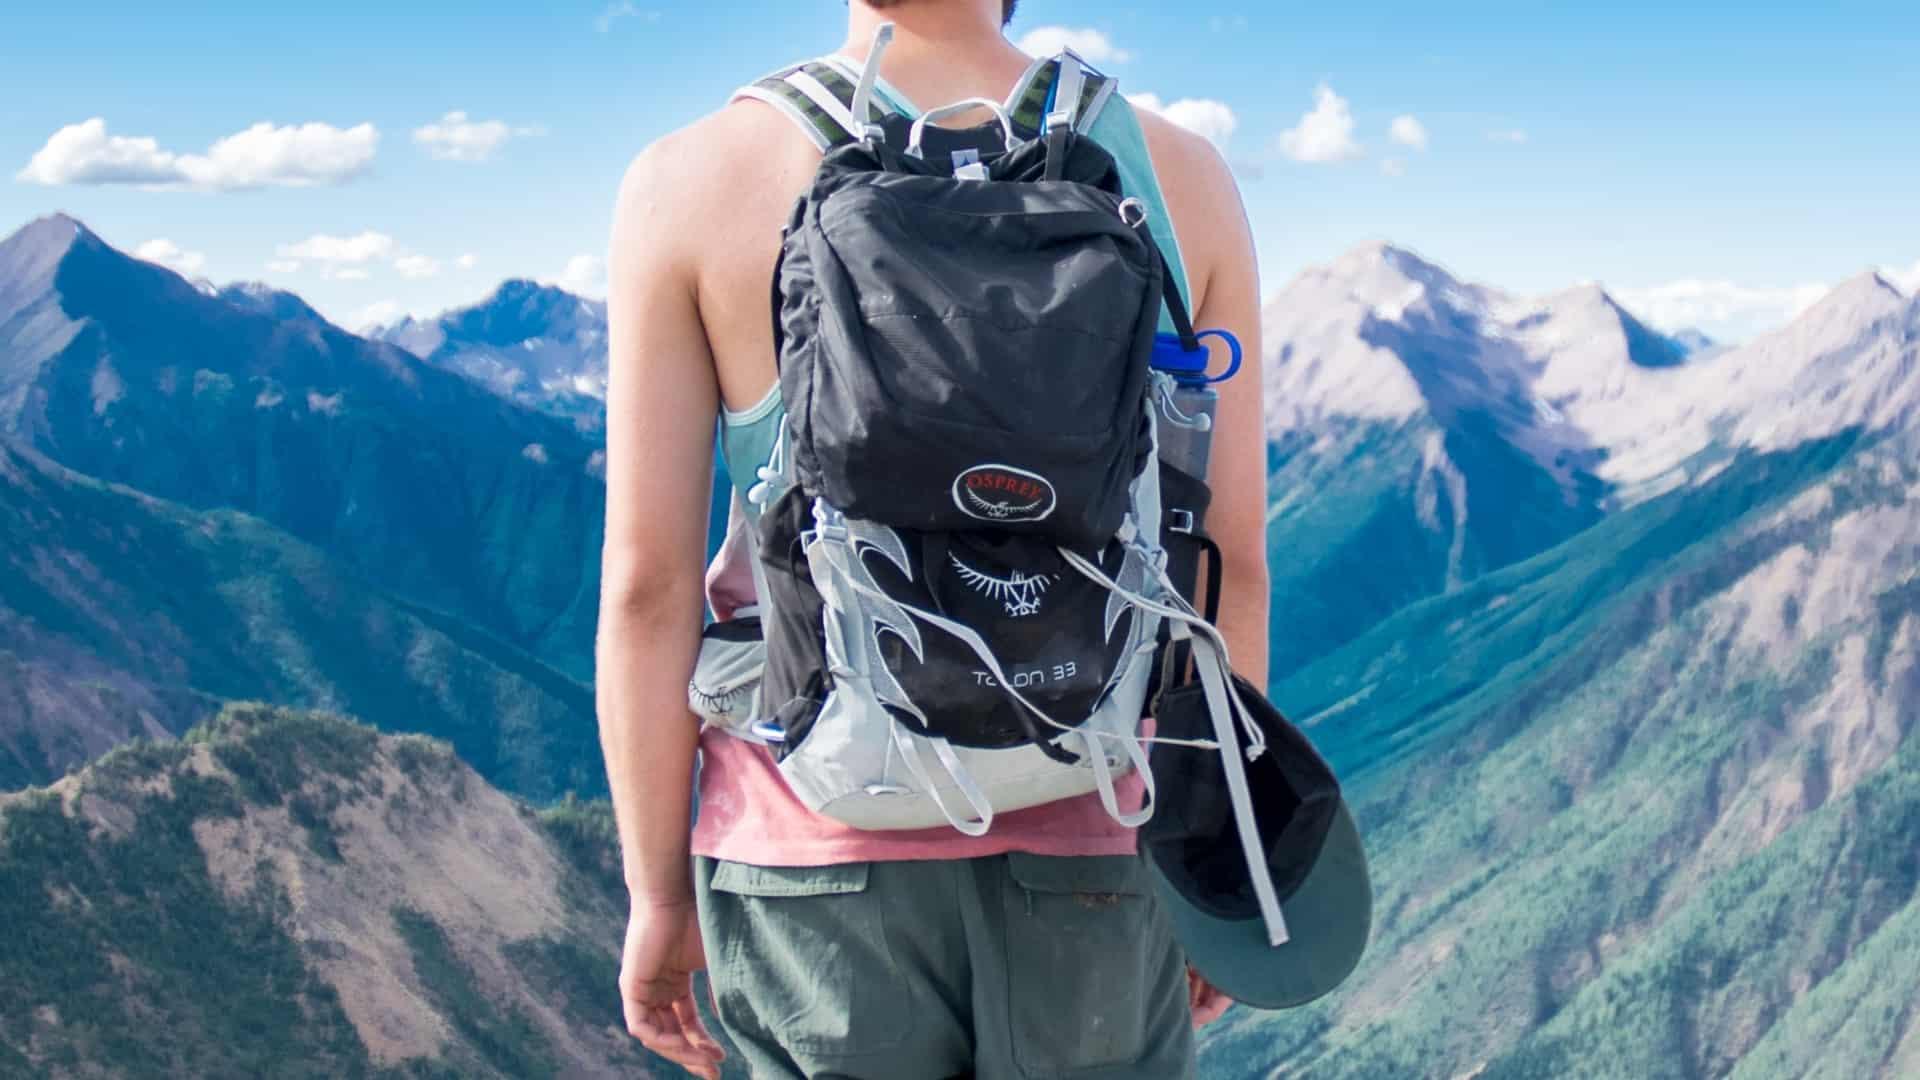 Mochila de trekking: ¿Cuál es la mejor del 2021?